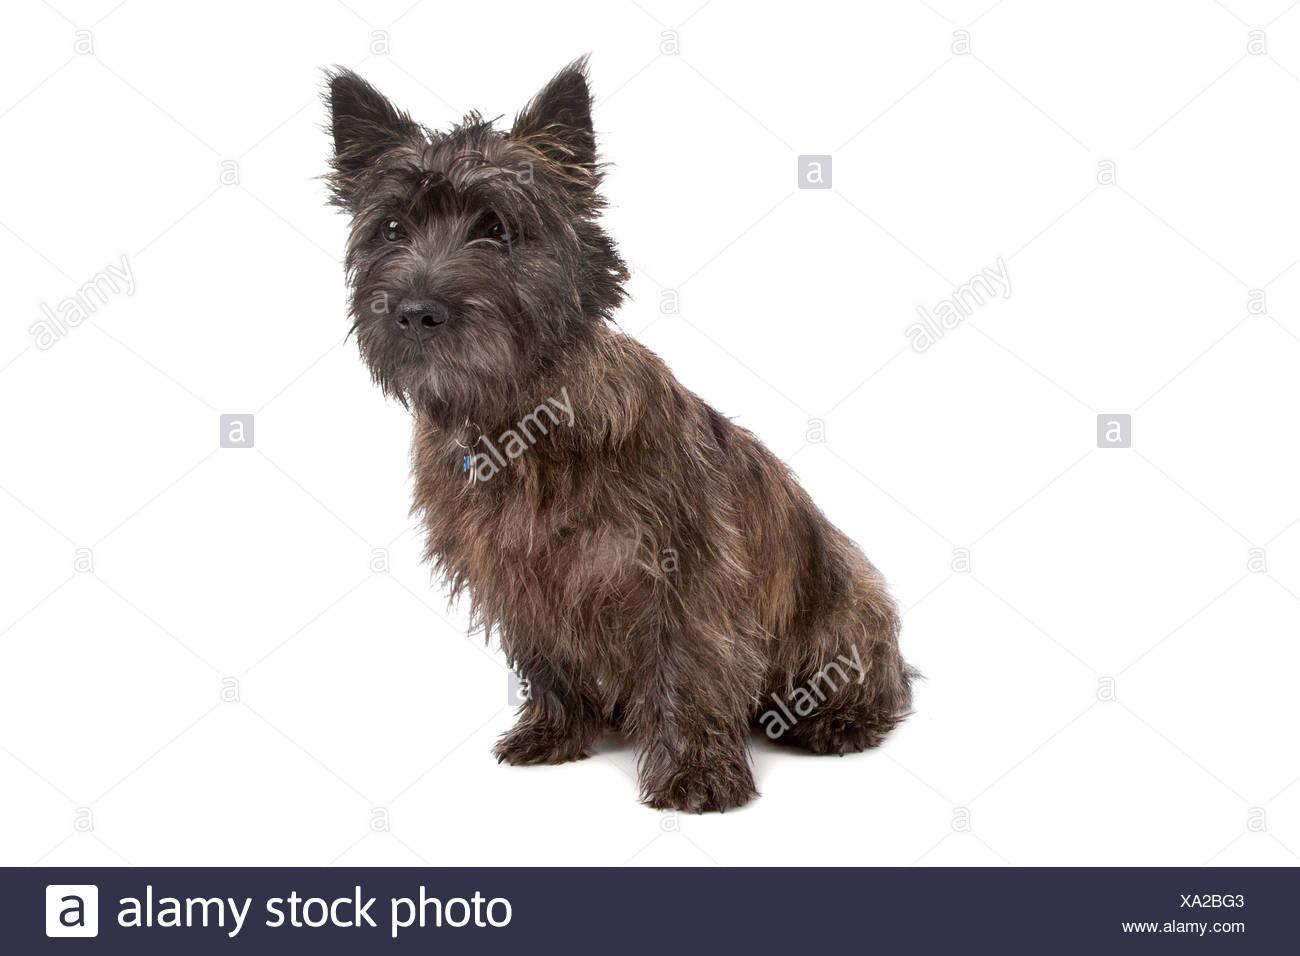 Dog Cairn Terrier Adult Sitting Stockfotos Dog Cairn Terrier Adult